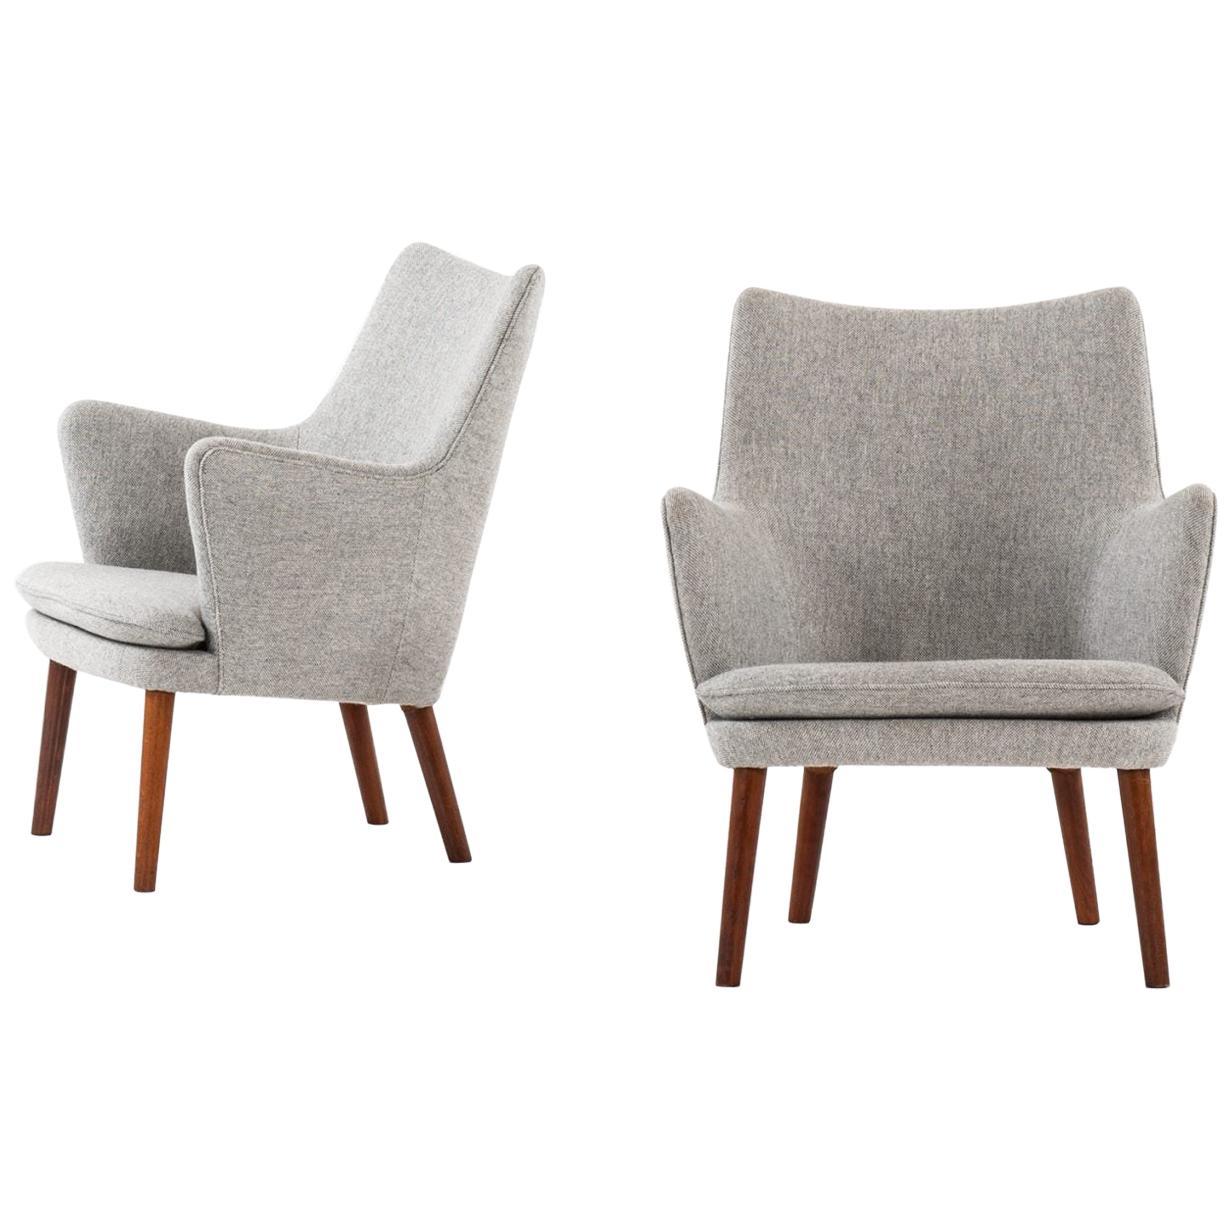 Hans Wegner Easy Chairs Model AP20 Produced by A.P. Stolen in Denmark